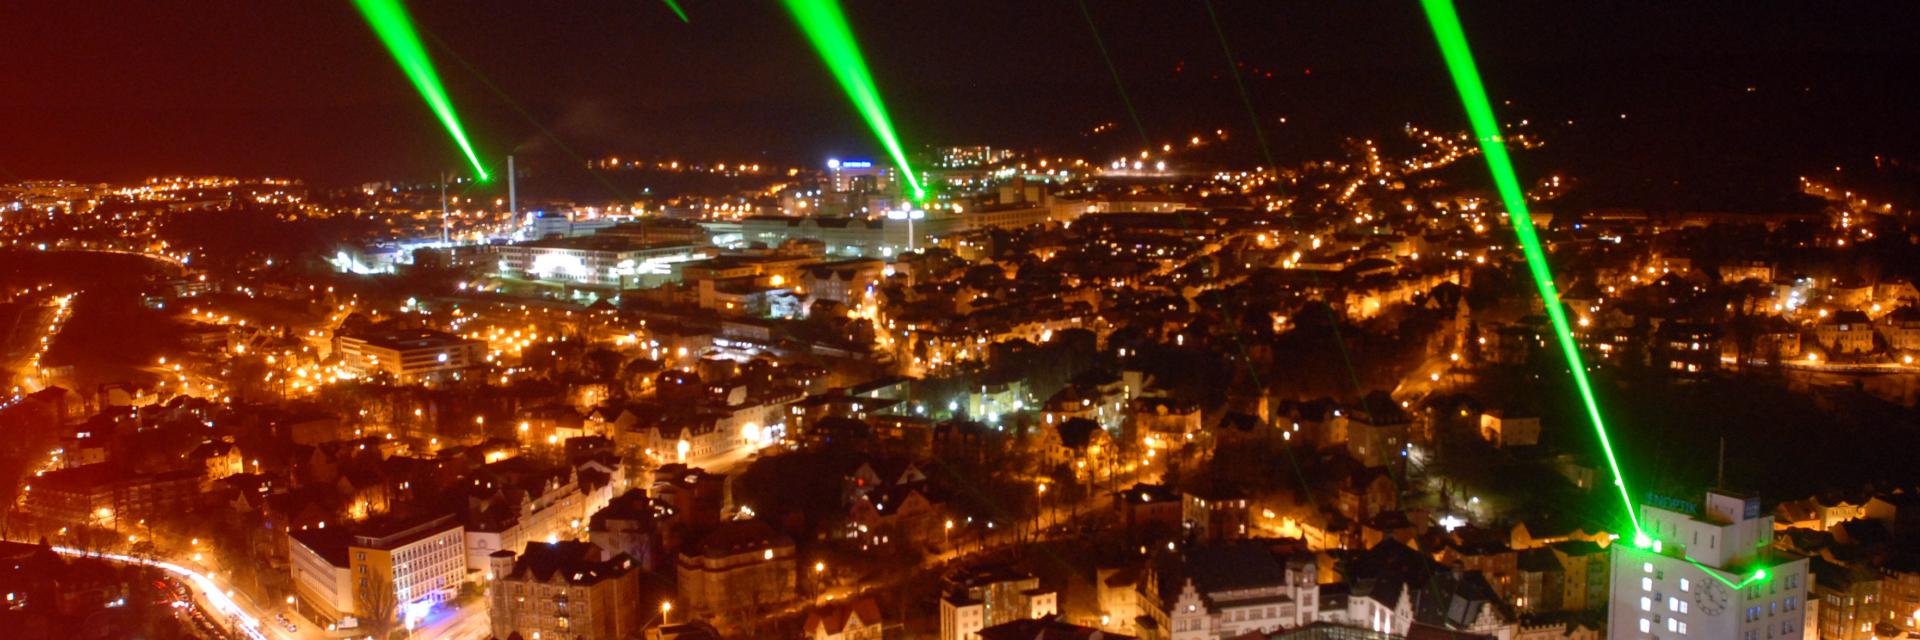 Lichtblick: Grüne Jenoptik Laser über Jena bei Nacht © JenaKultur, Foto: Tino Zippel